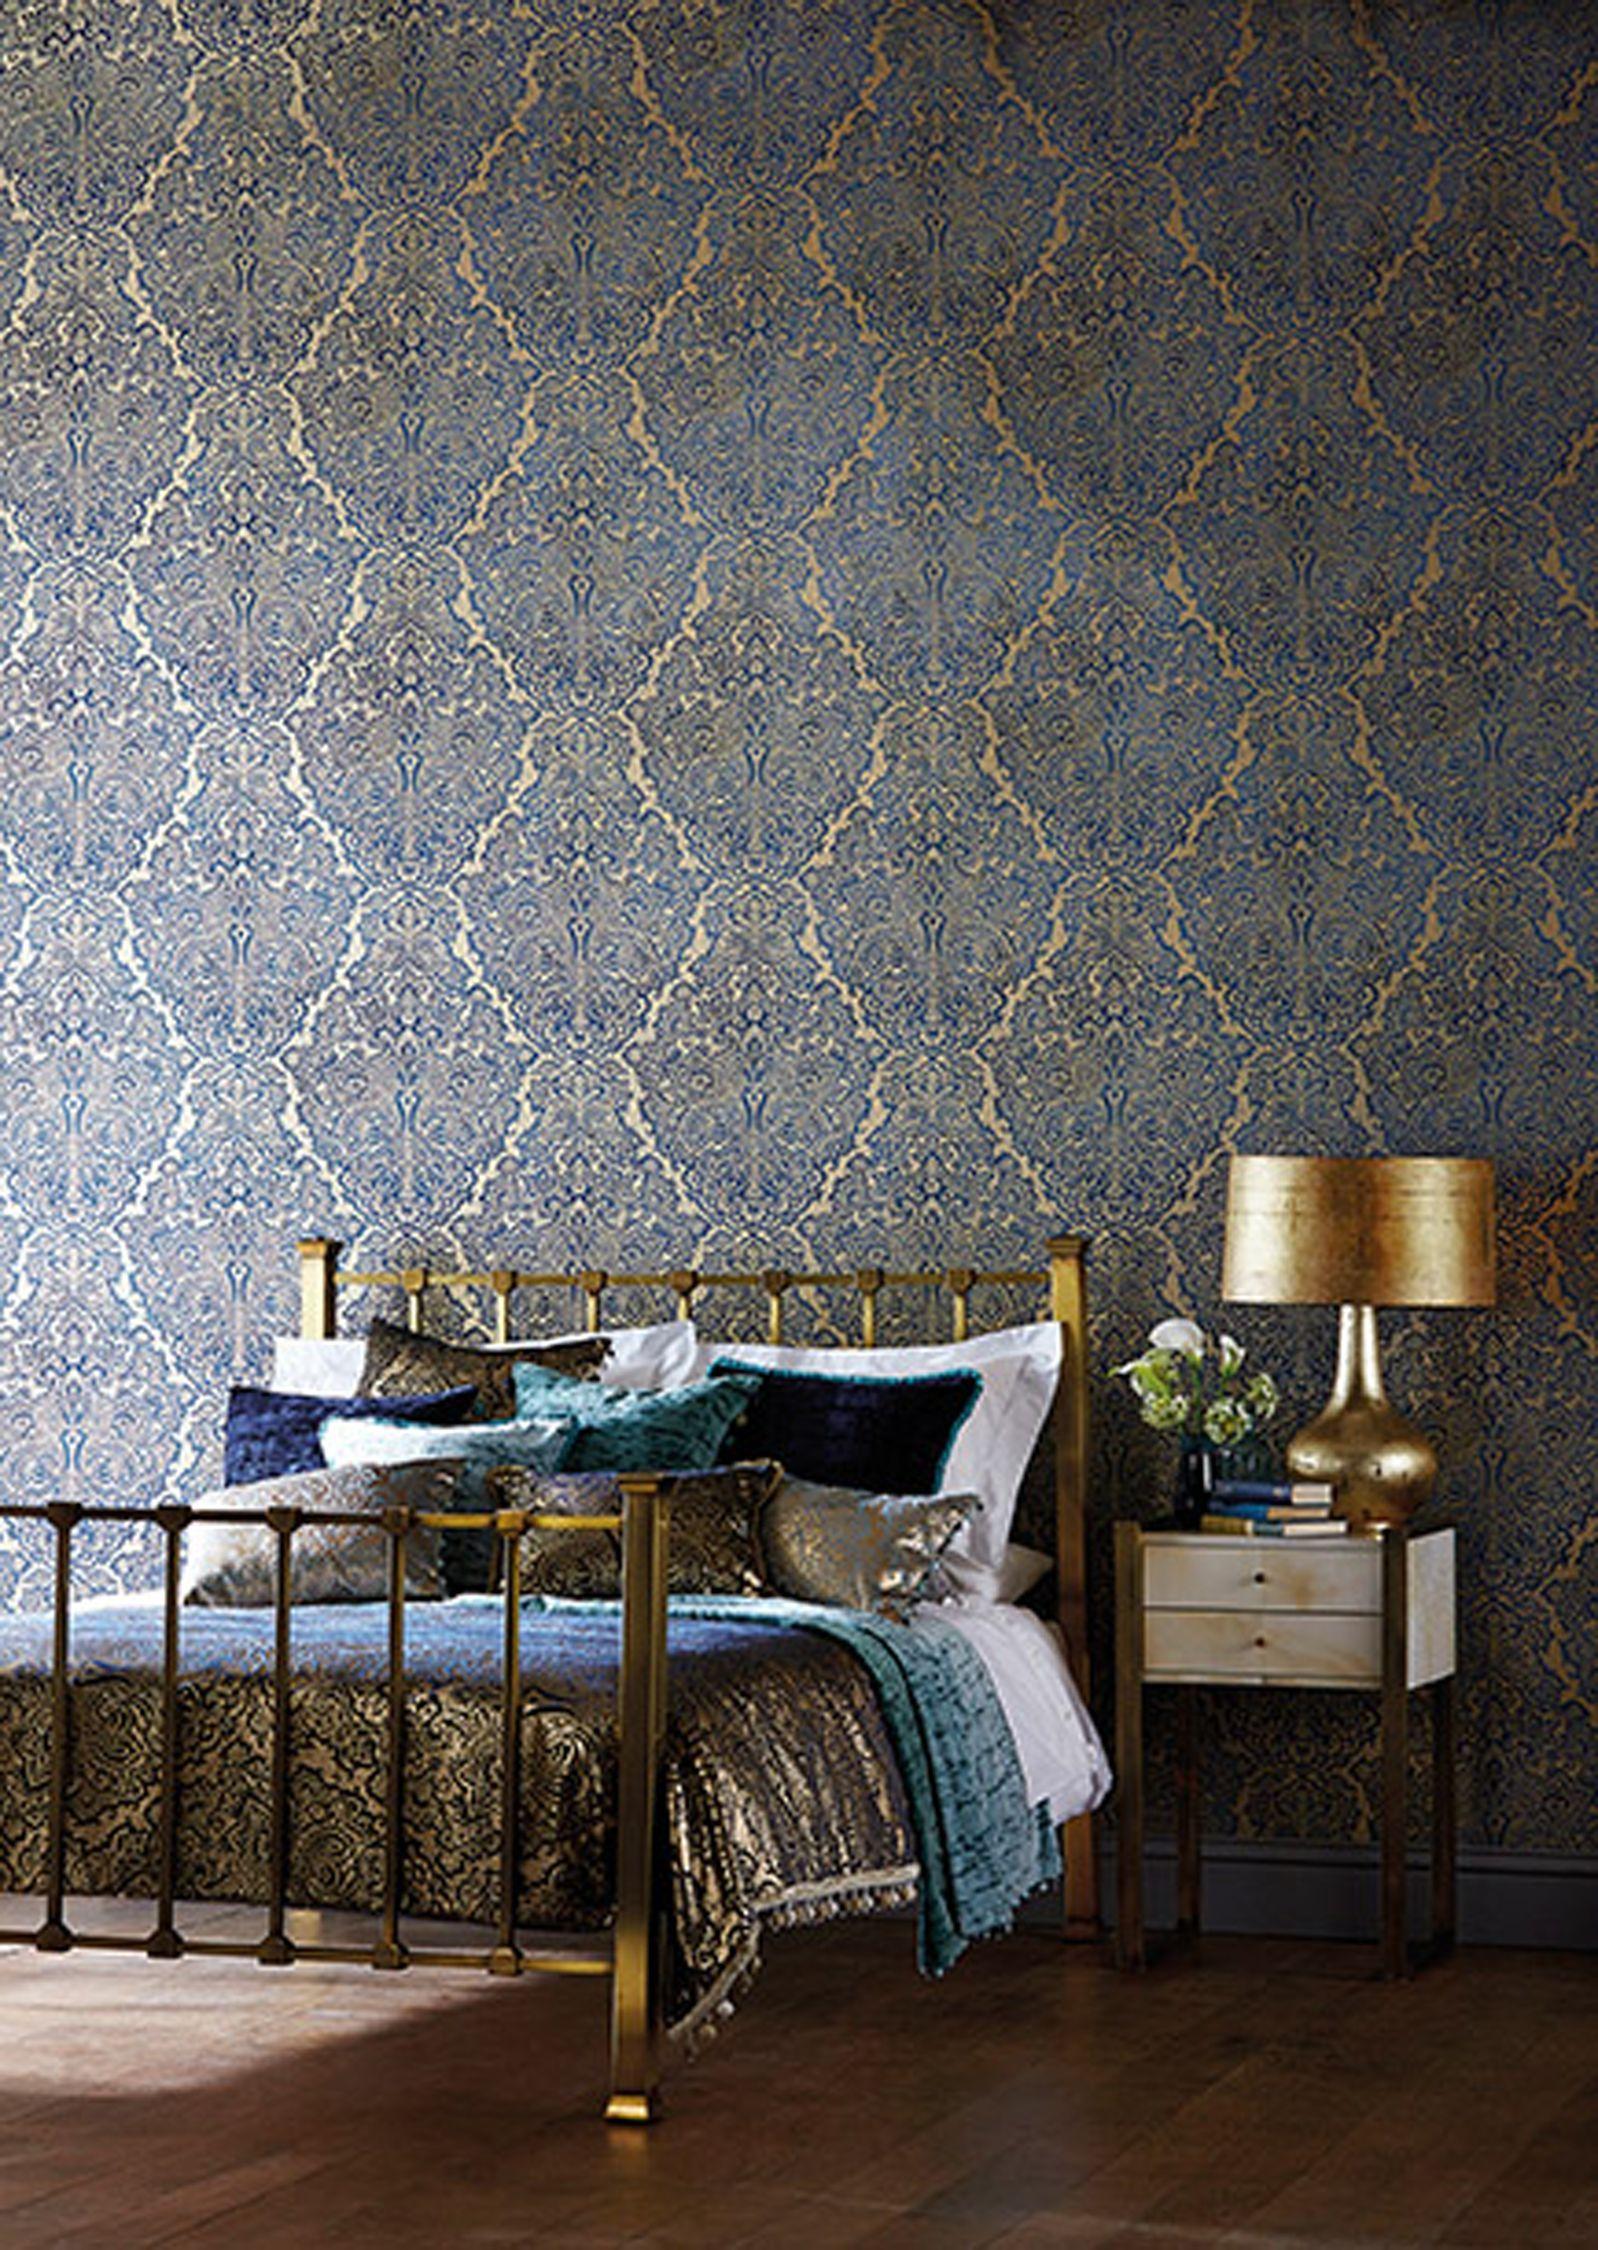 Harlequin Aurelia Paste the Wall Wallpaper, Antique Gold